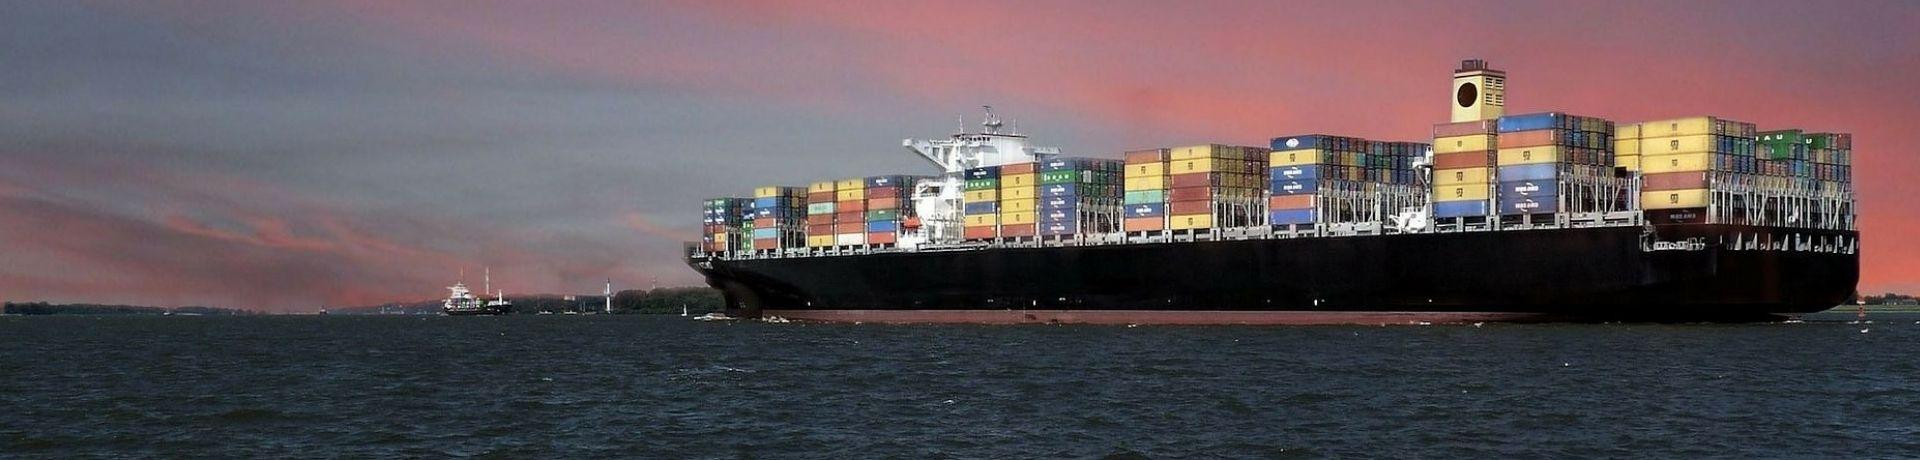 Maritime Transports